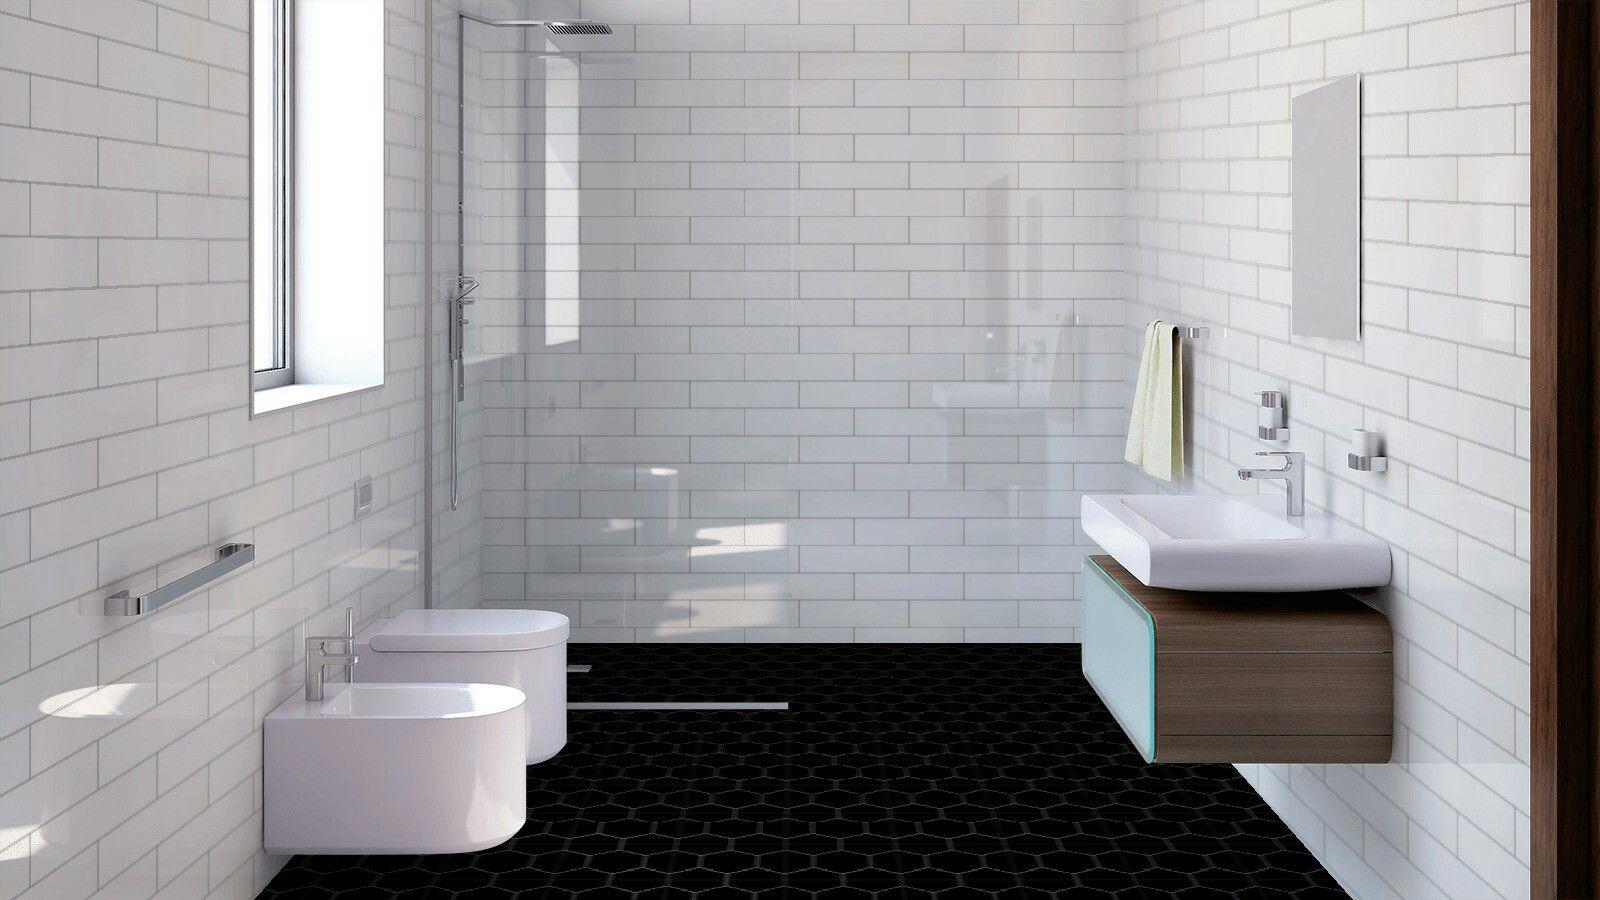 City Matt White 100x400 With Pure Black Matt Hexagon Www Tilemax Co Nz Bathroom Top Bathroom Layout Tile Bathroom